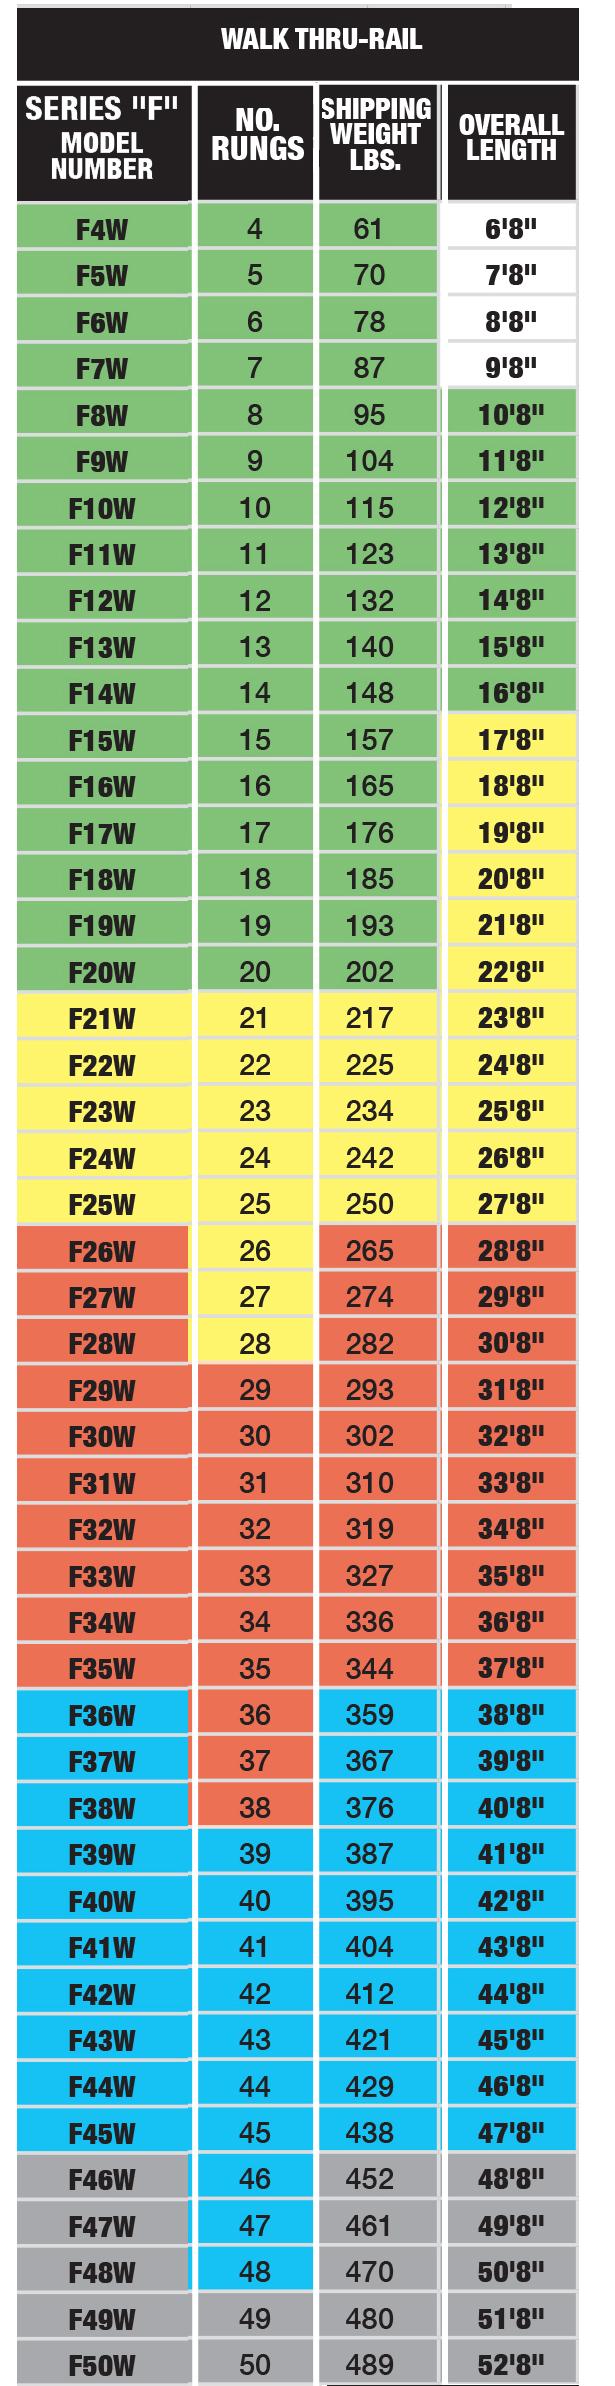 cotterman-fw-series-sizes.jpg